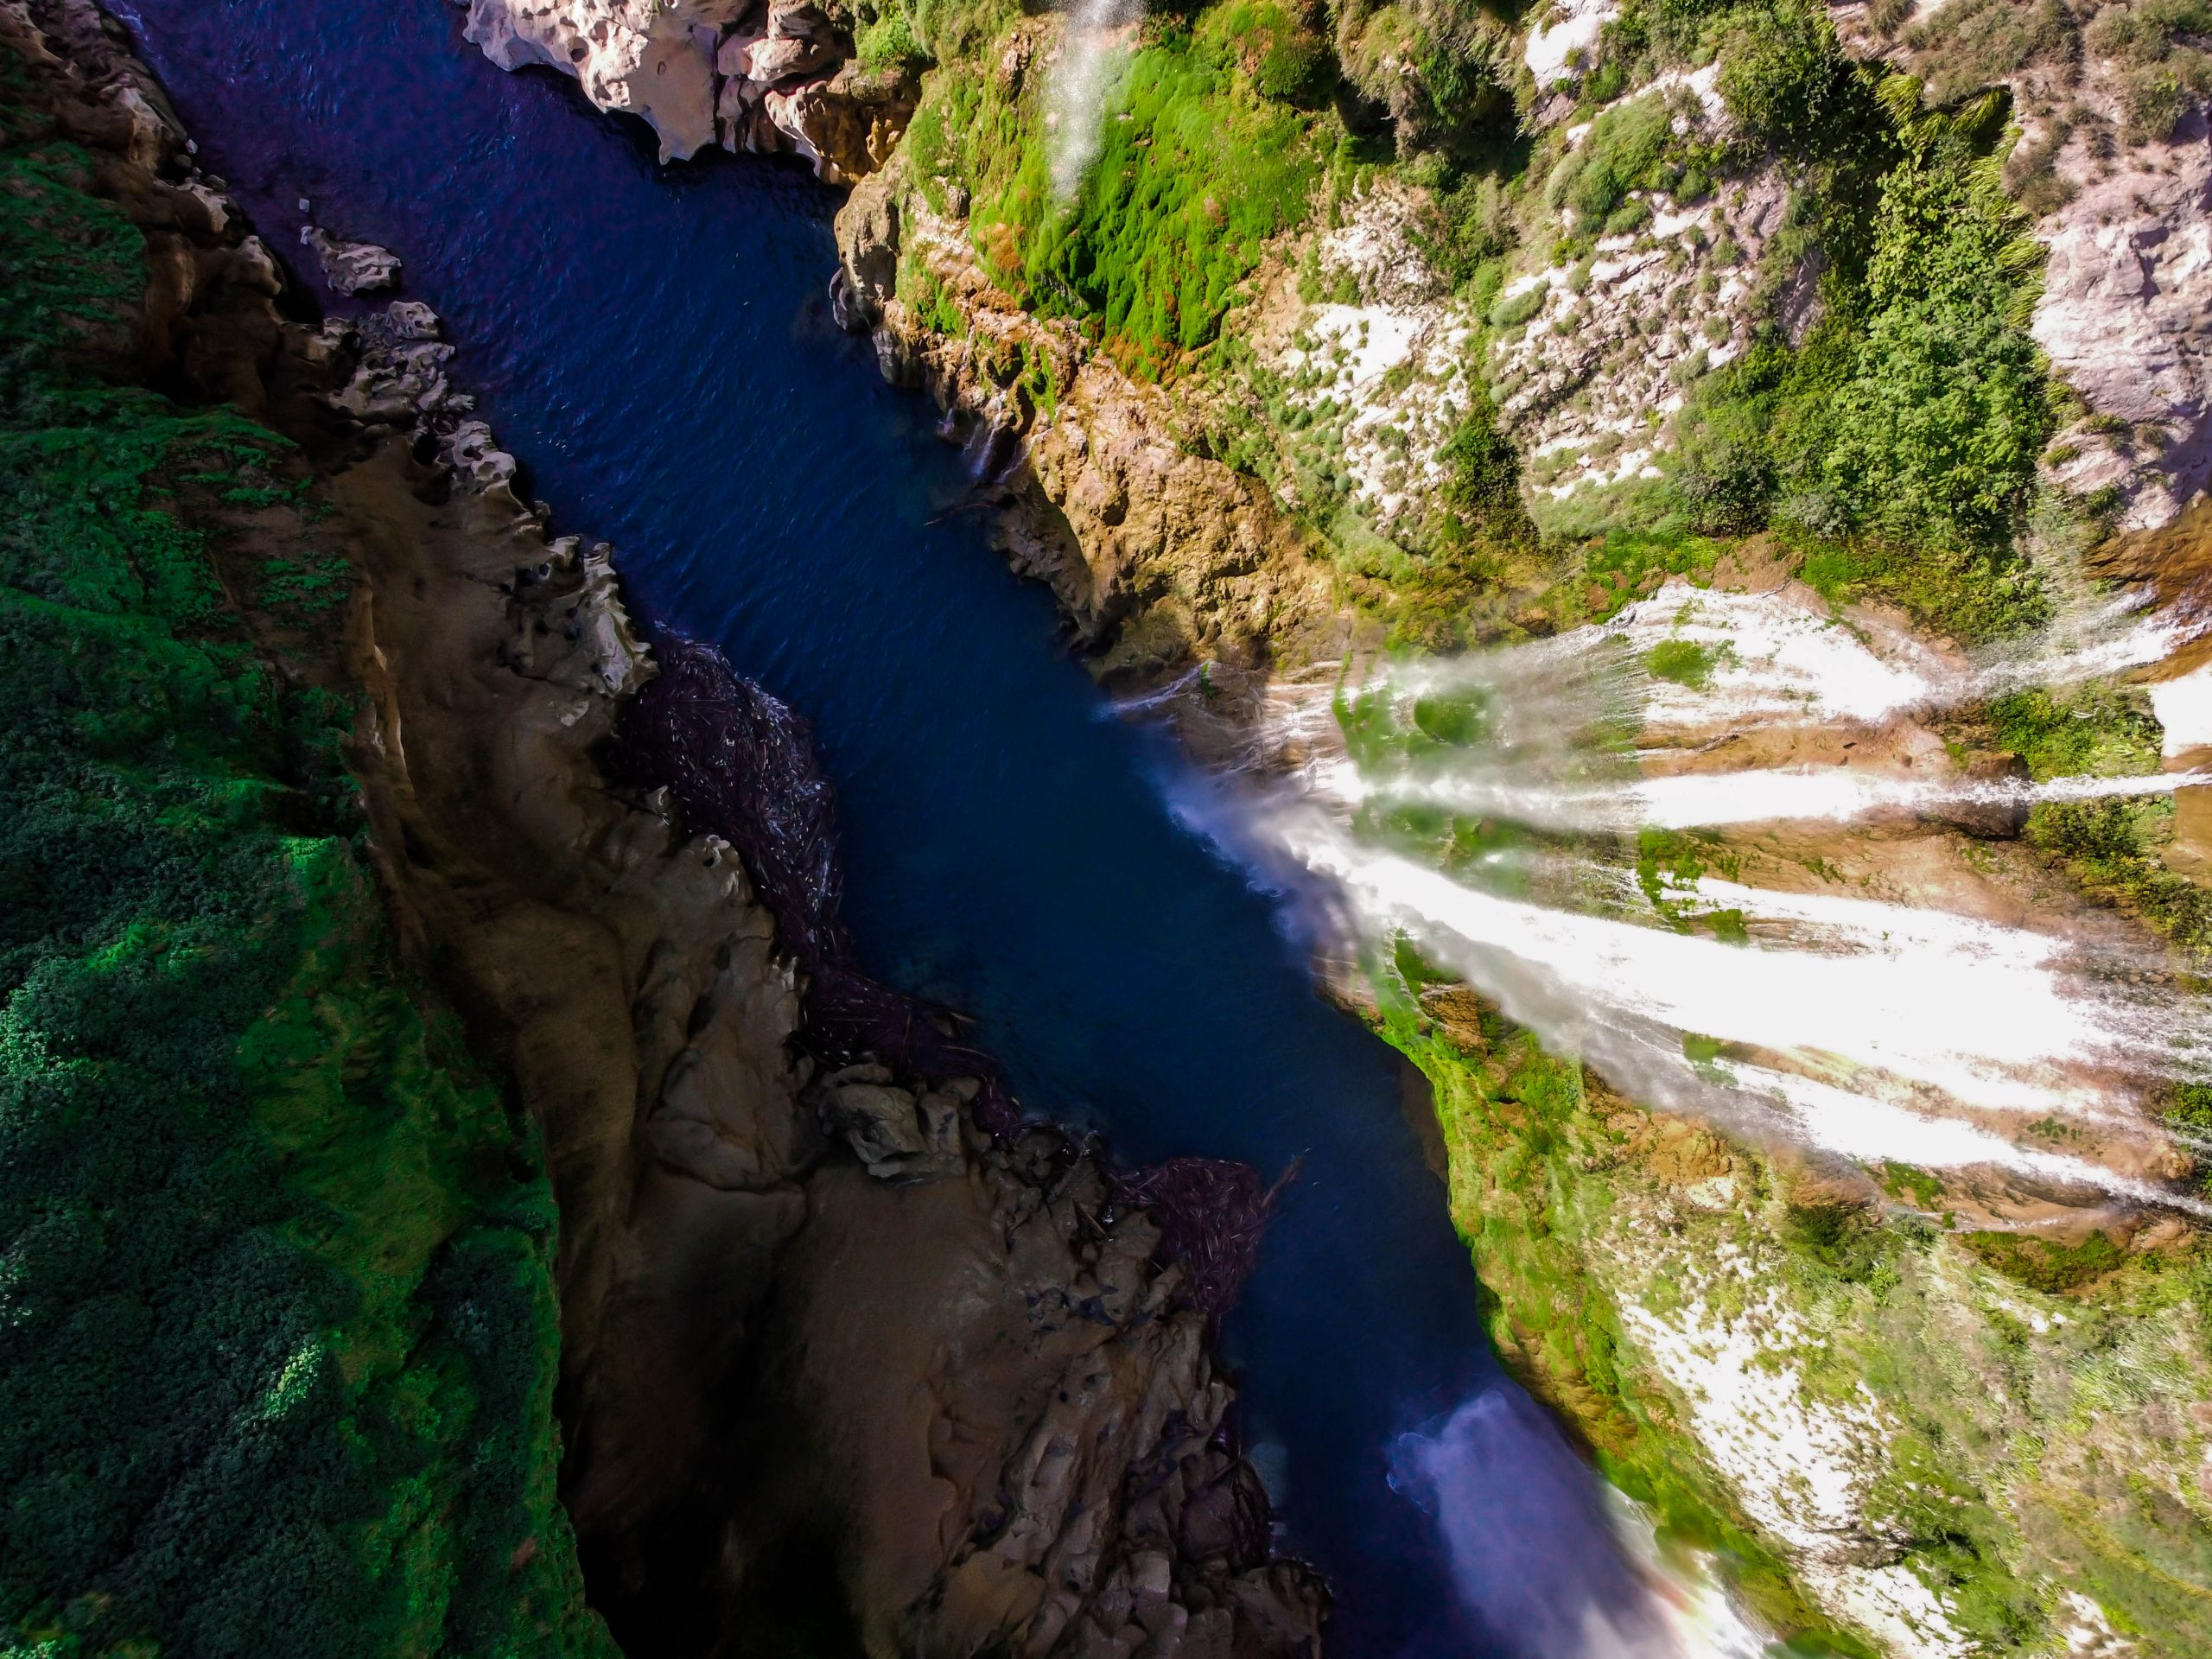 cascada de tamul la huasteca potosina san luis potosi mexico drone tampaon river dji mavic mini